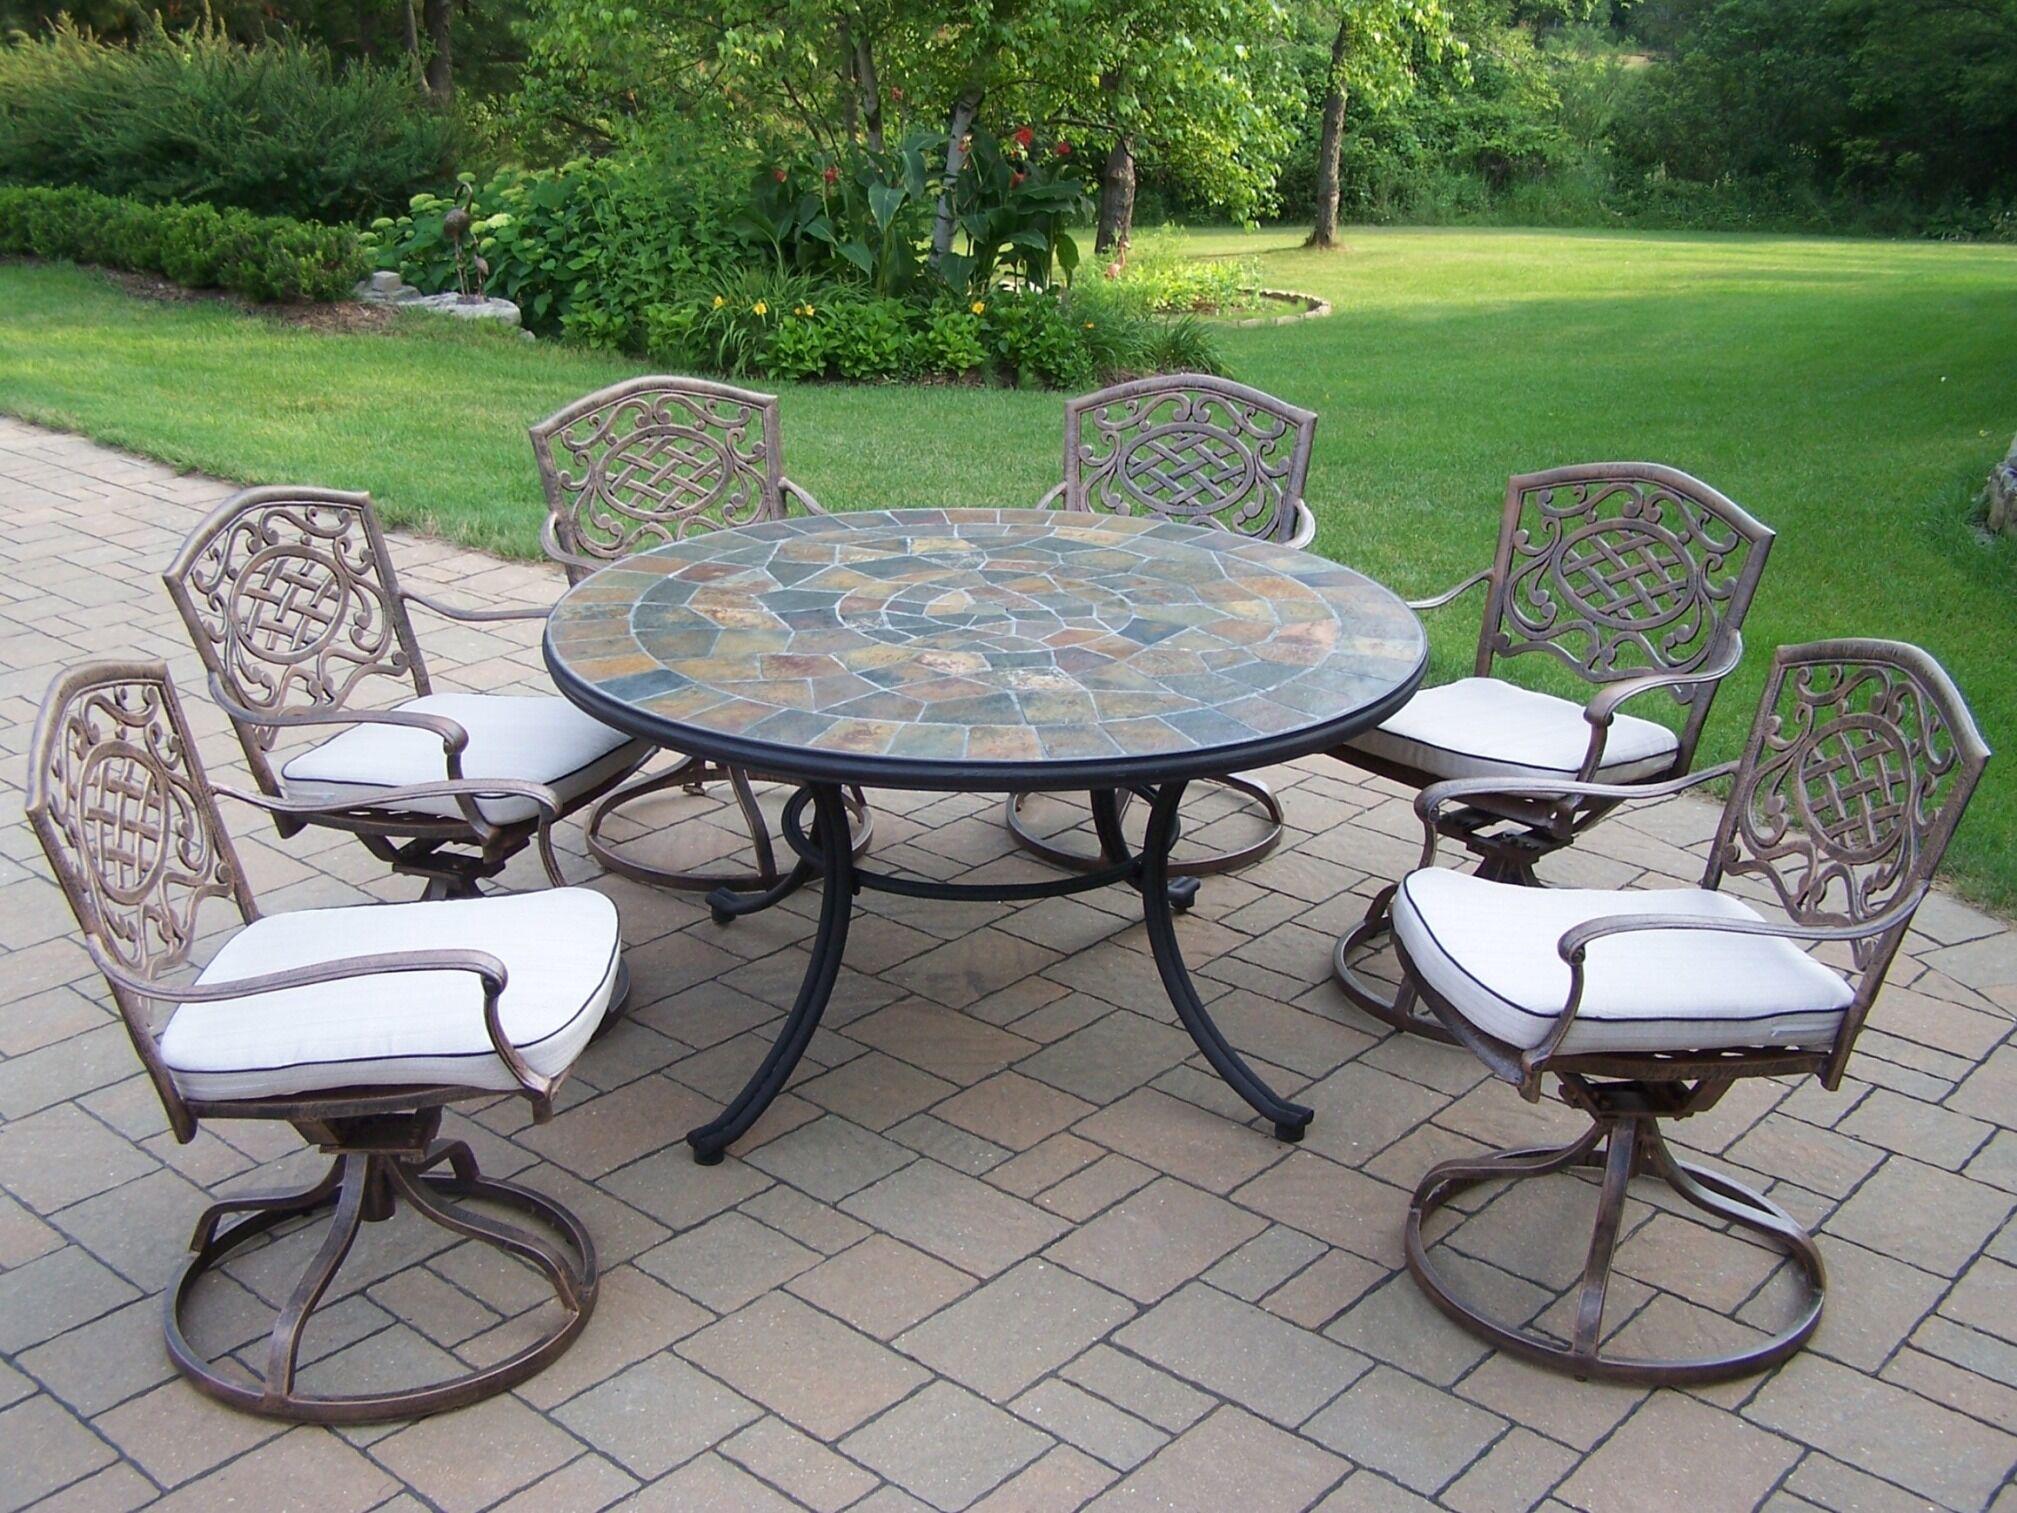 Tuscany Stone Art Swivel Chair Dining Set